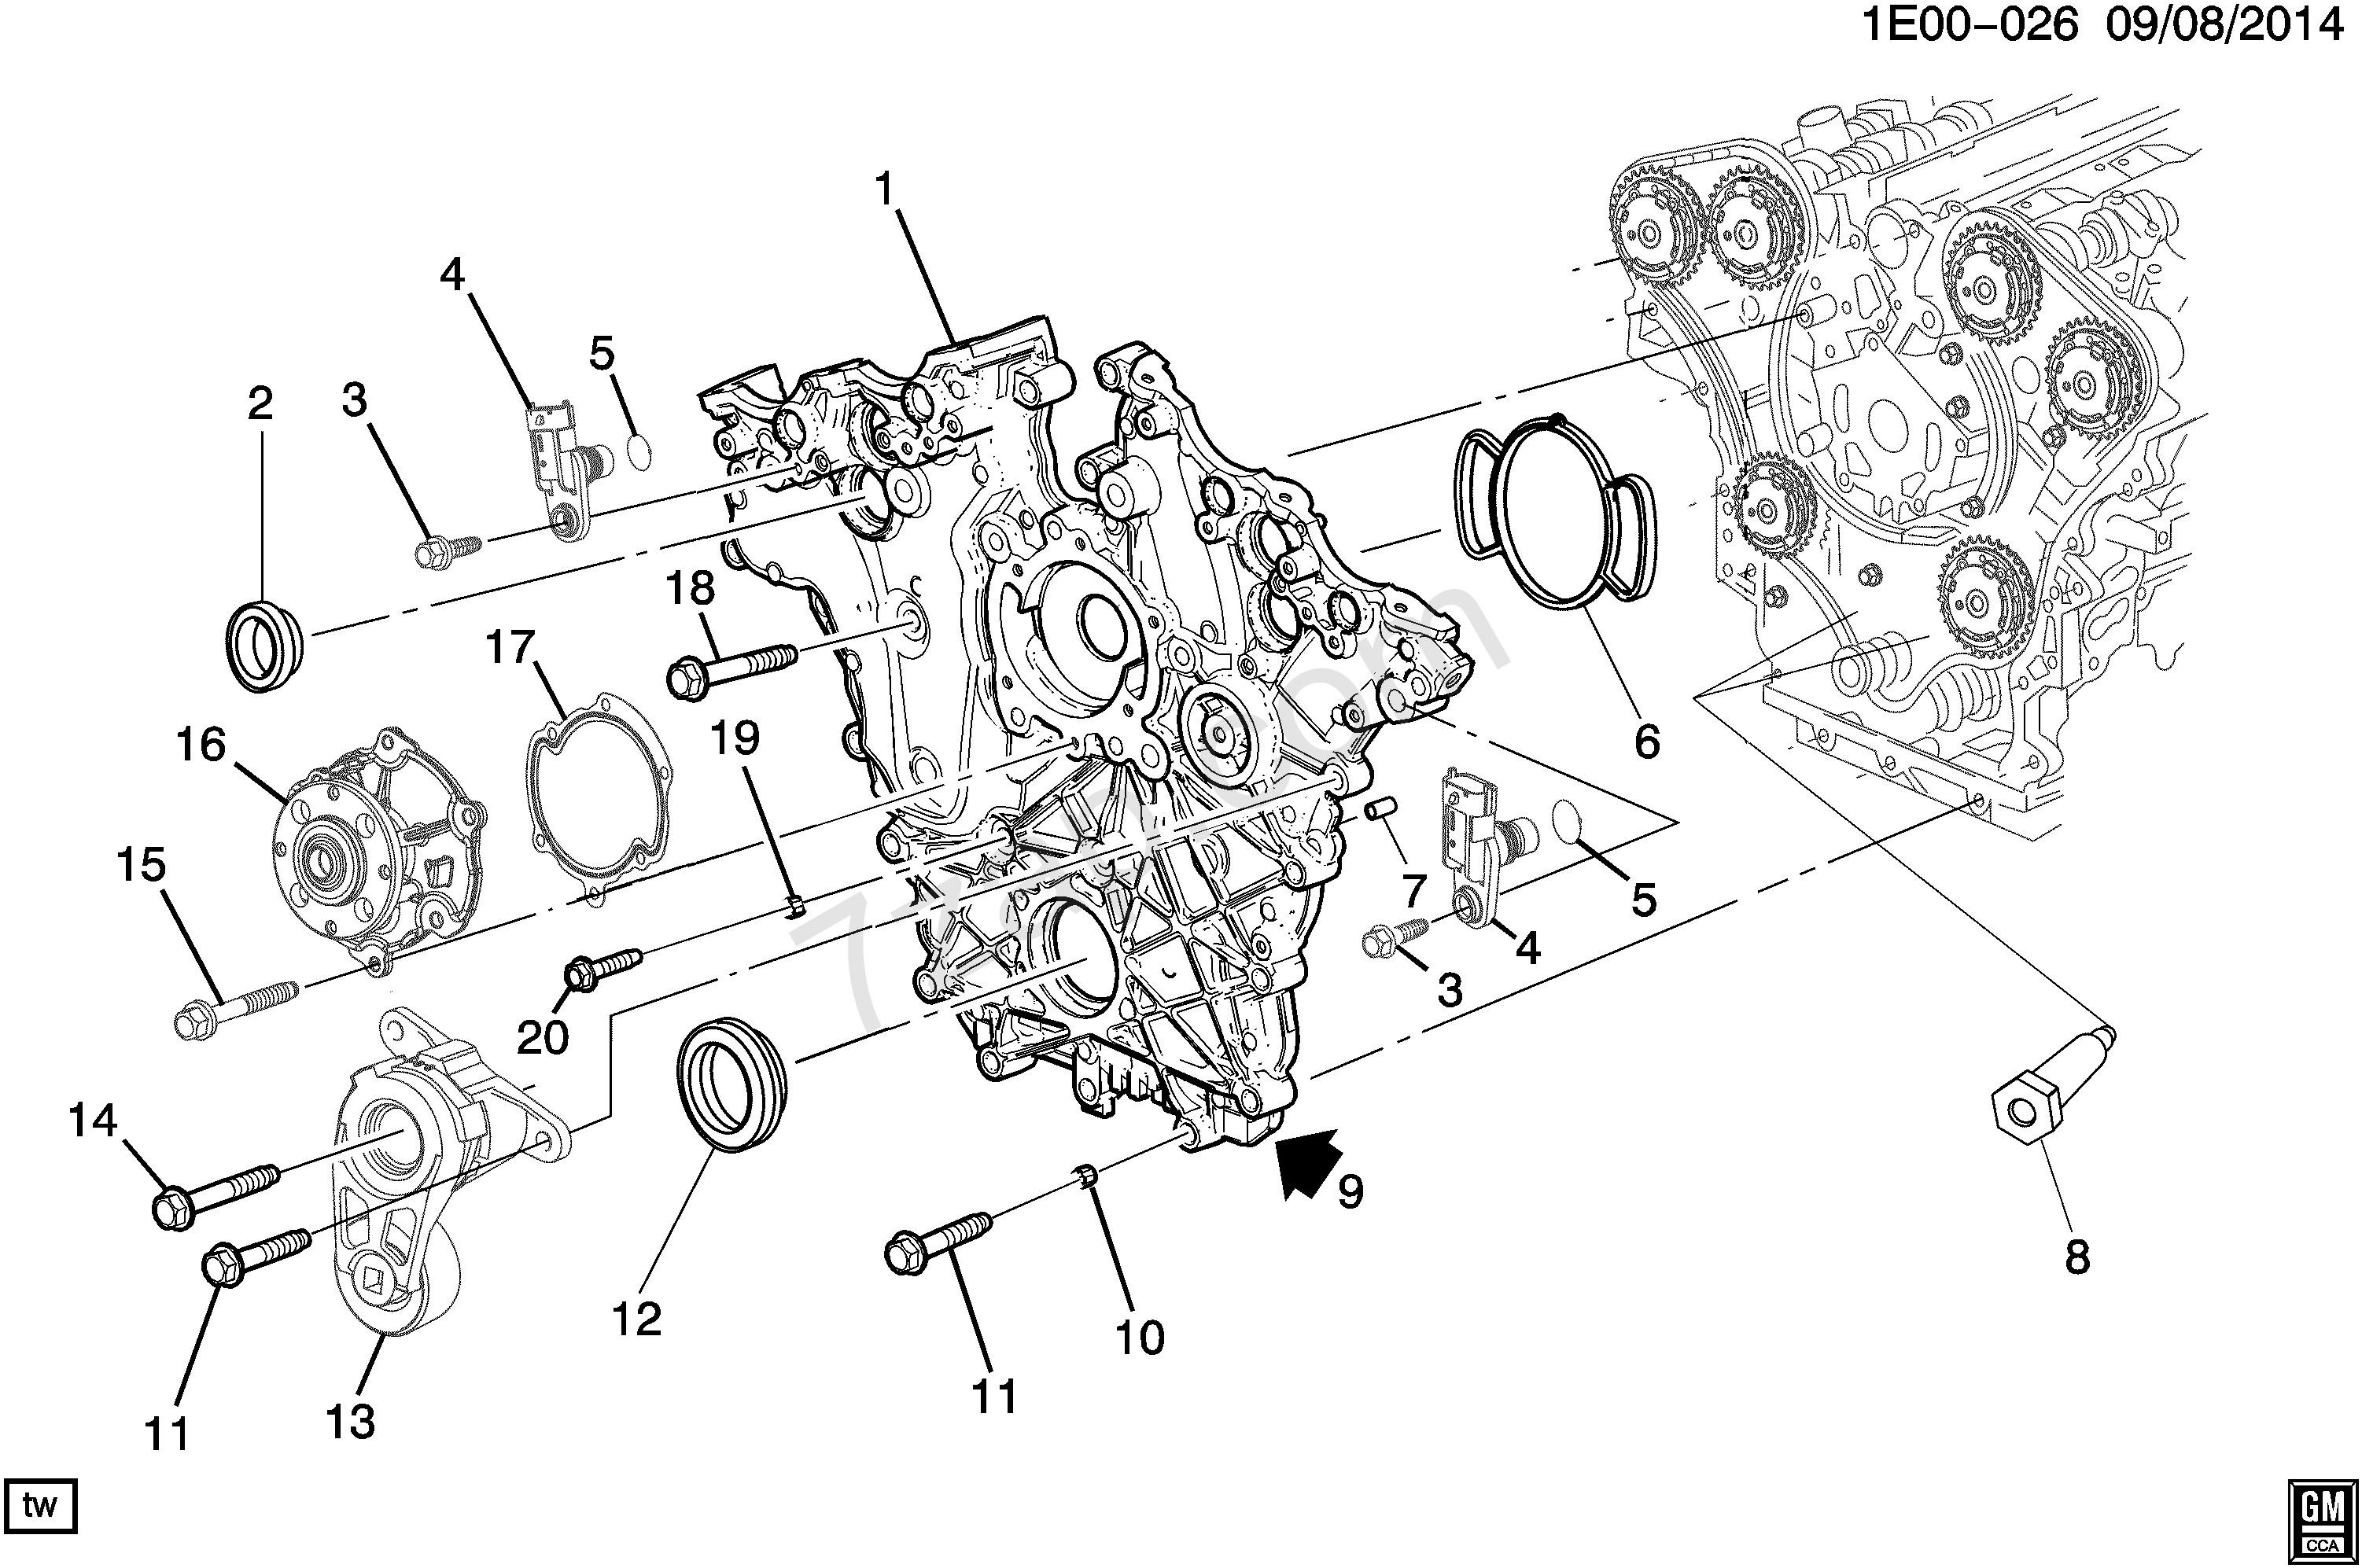 Chevy 3 1 Engine Diagram Wiring Diagrams My Ek 2012 2017 Ek19 Asm 6l V6 Front Cover Lfx